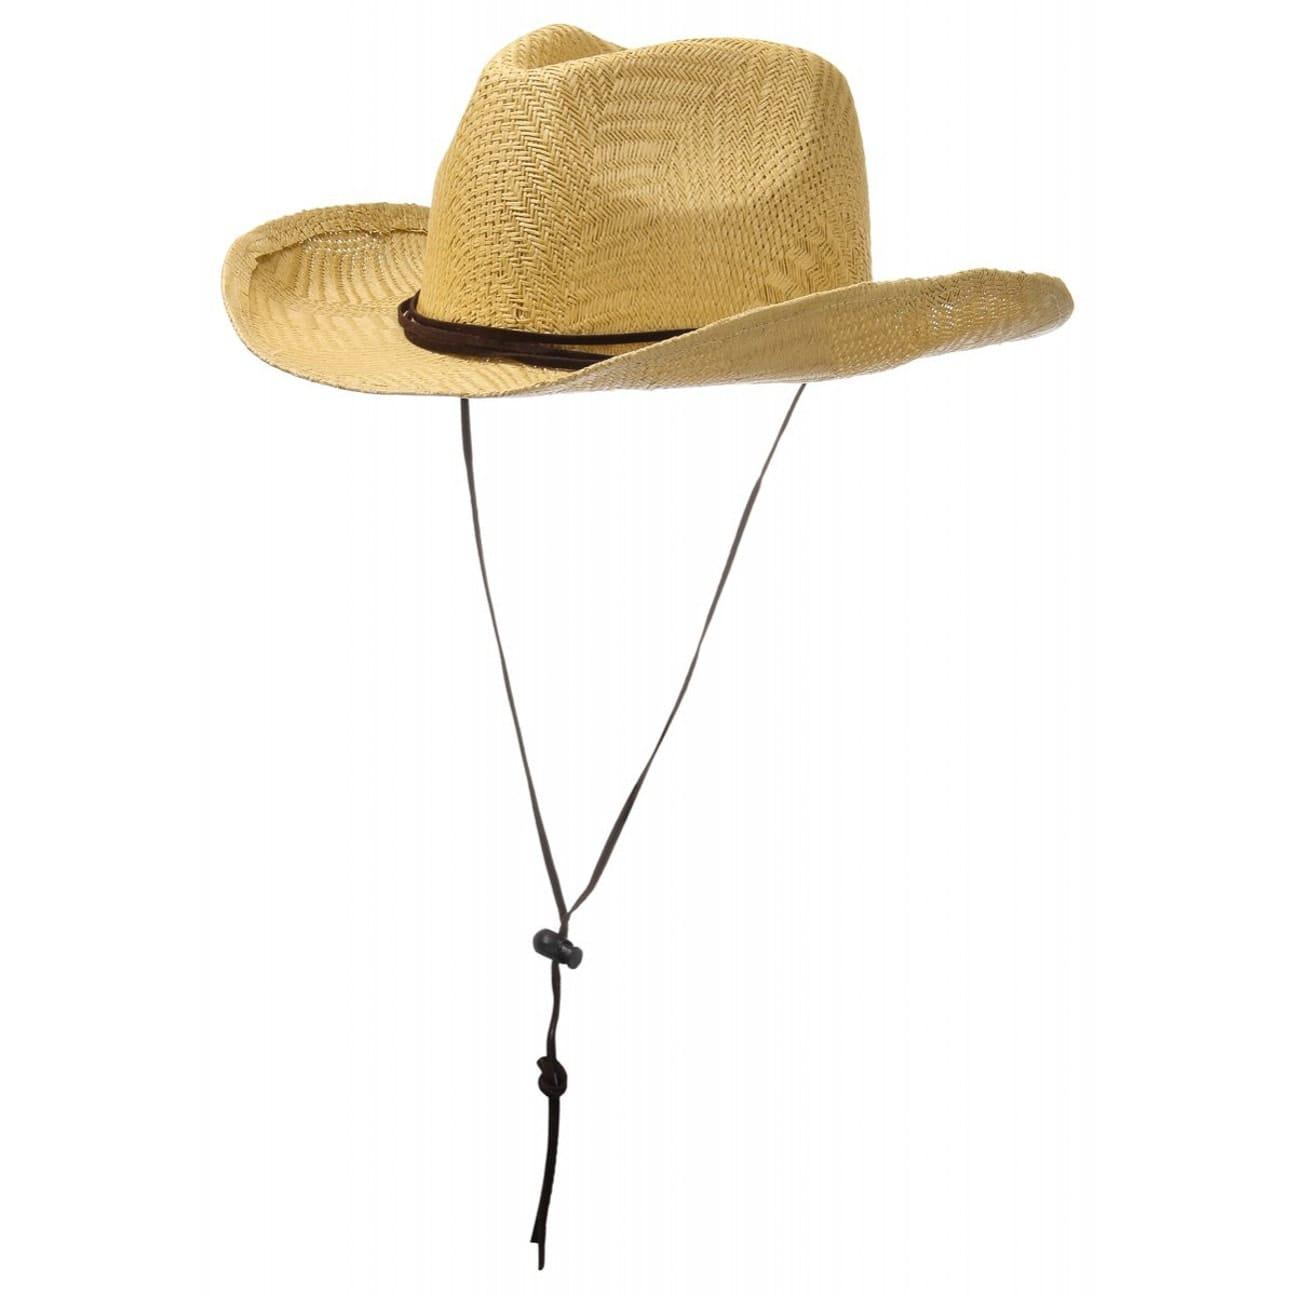 Sombrero de Paja Outrider by Scippis  sombrero de hombre